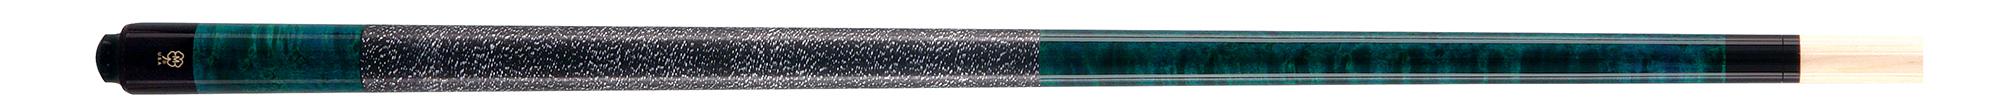 McDermott GS08 DW blue/green pool